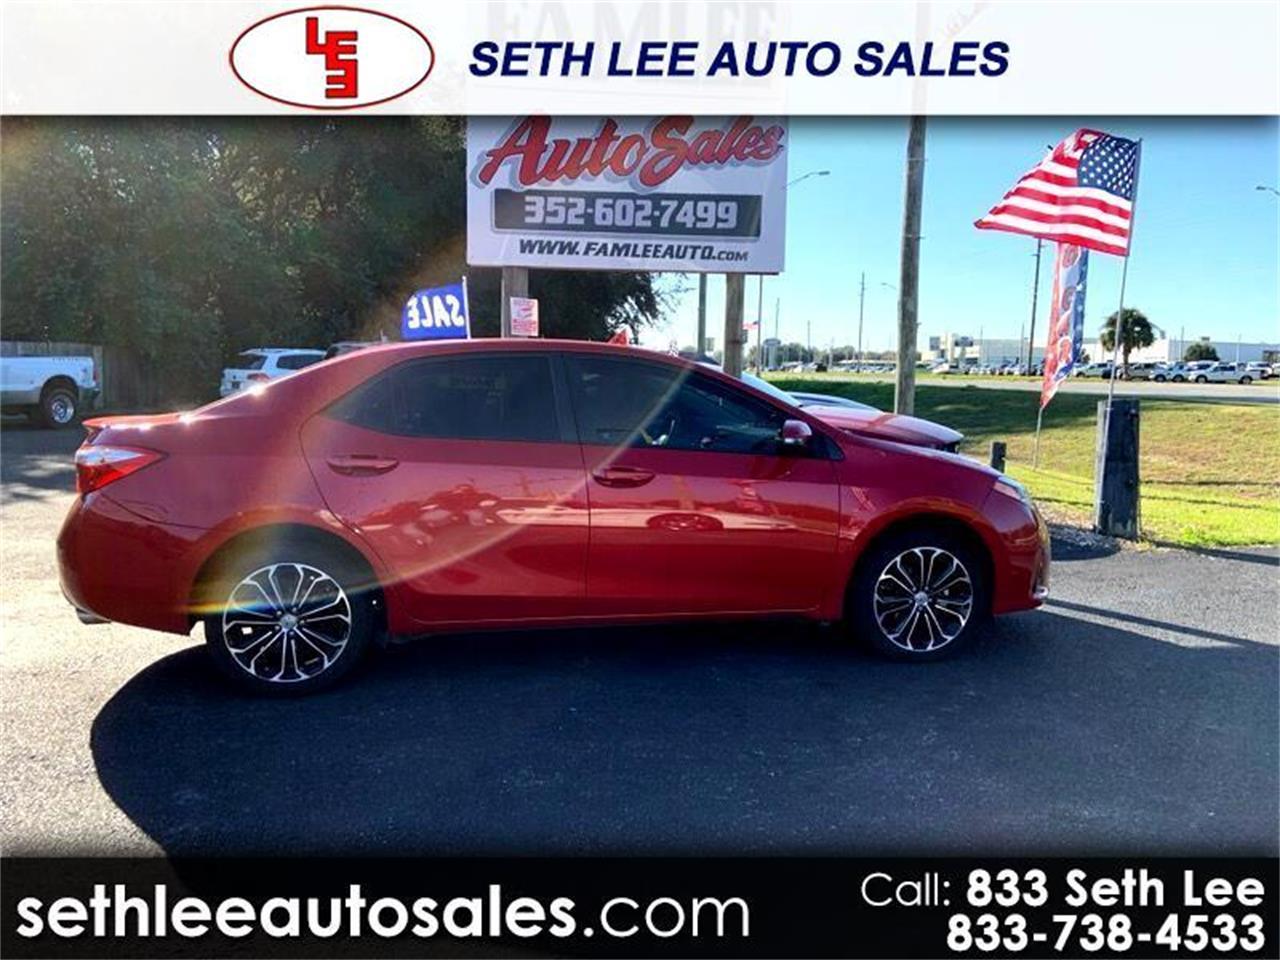 2016 Toyota Corolla (CC-1359218) for sale in Tavares, Florida